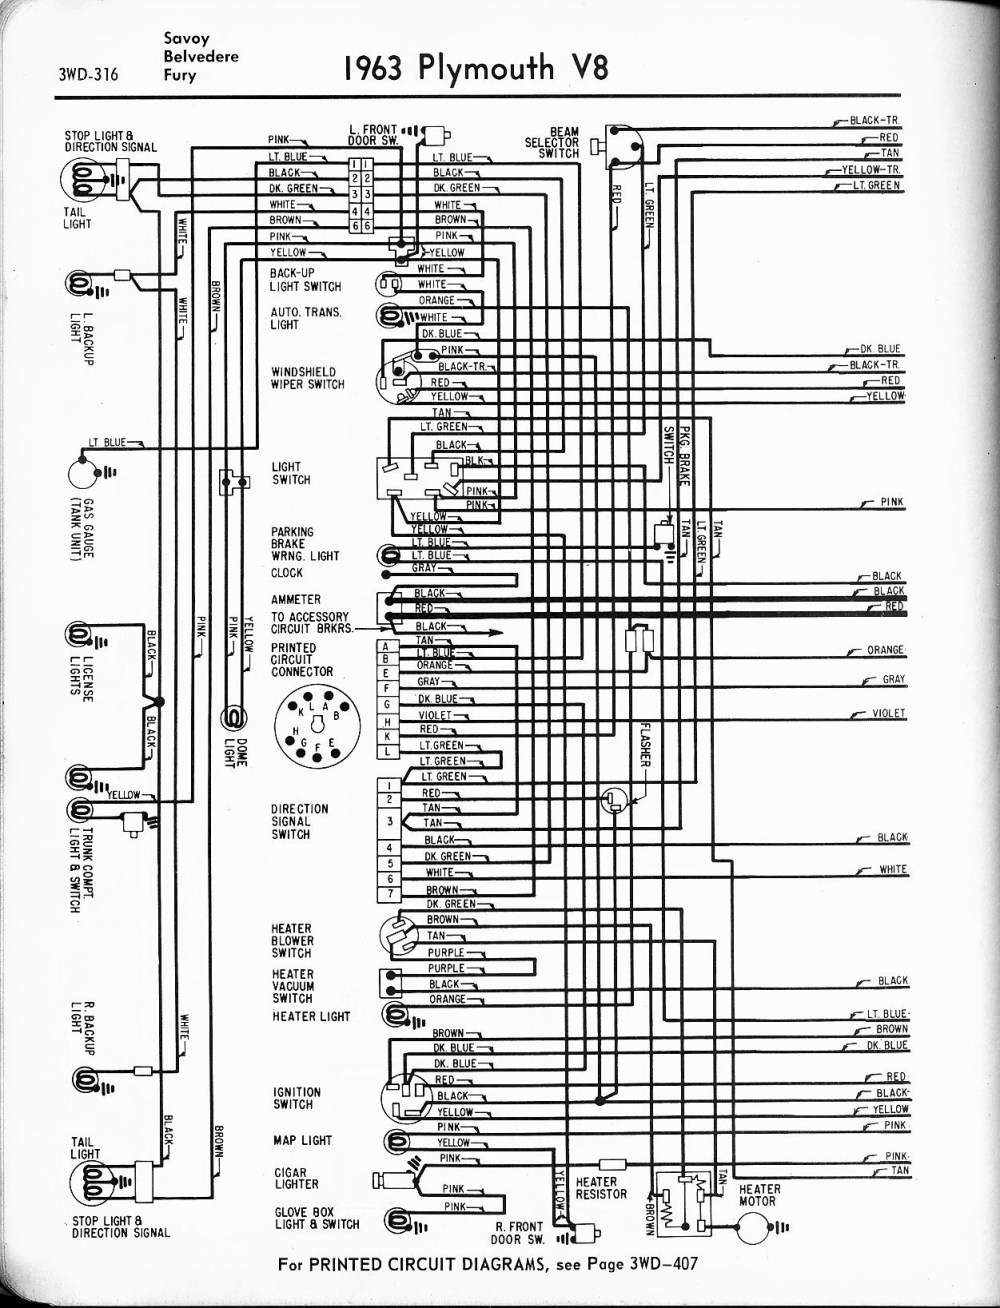 medium resolution of 1965 plymouth valiant wiring diagram wiring diagram autovehicle1963 plymouth wiring diagram wiring diagram completed63 plymouth wiring